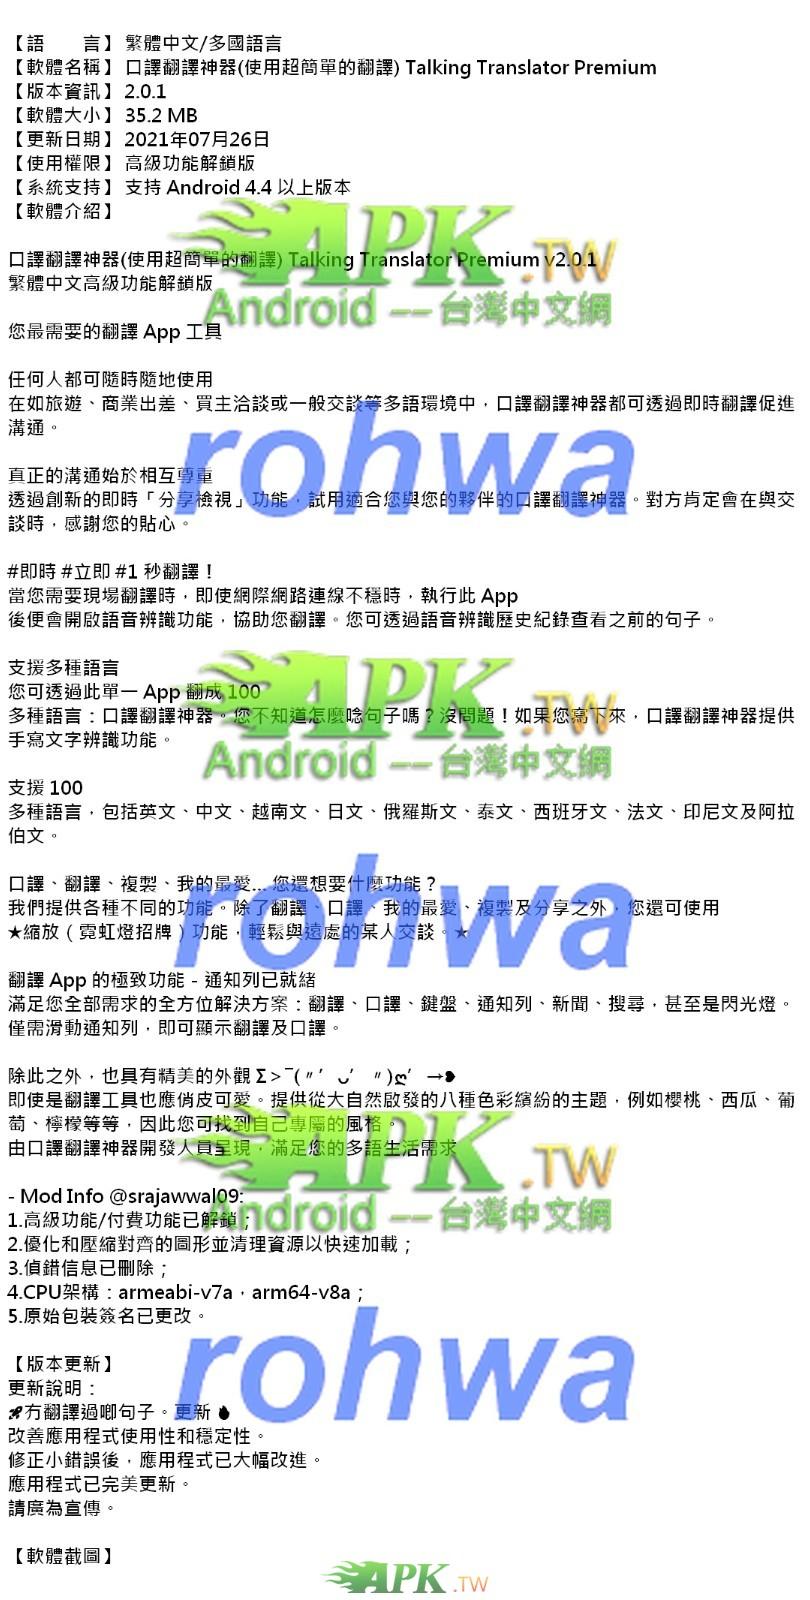 TalkingTranslator_Premium_2.0.1_.jpg